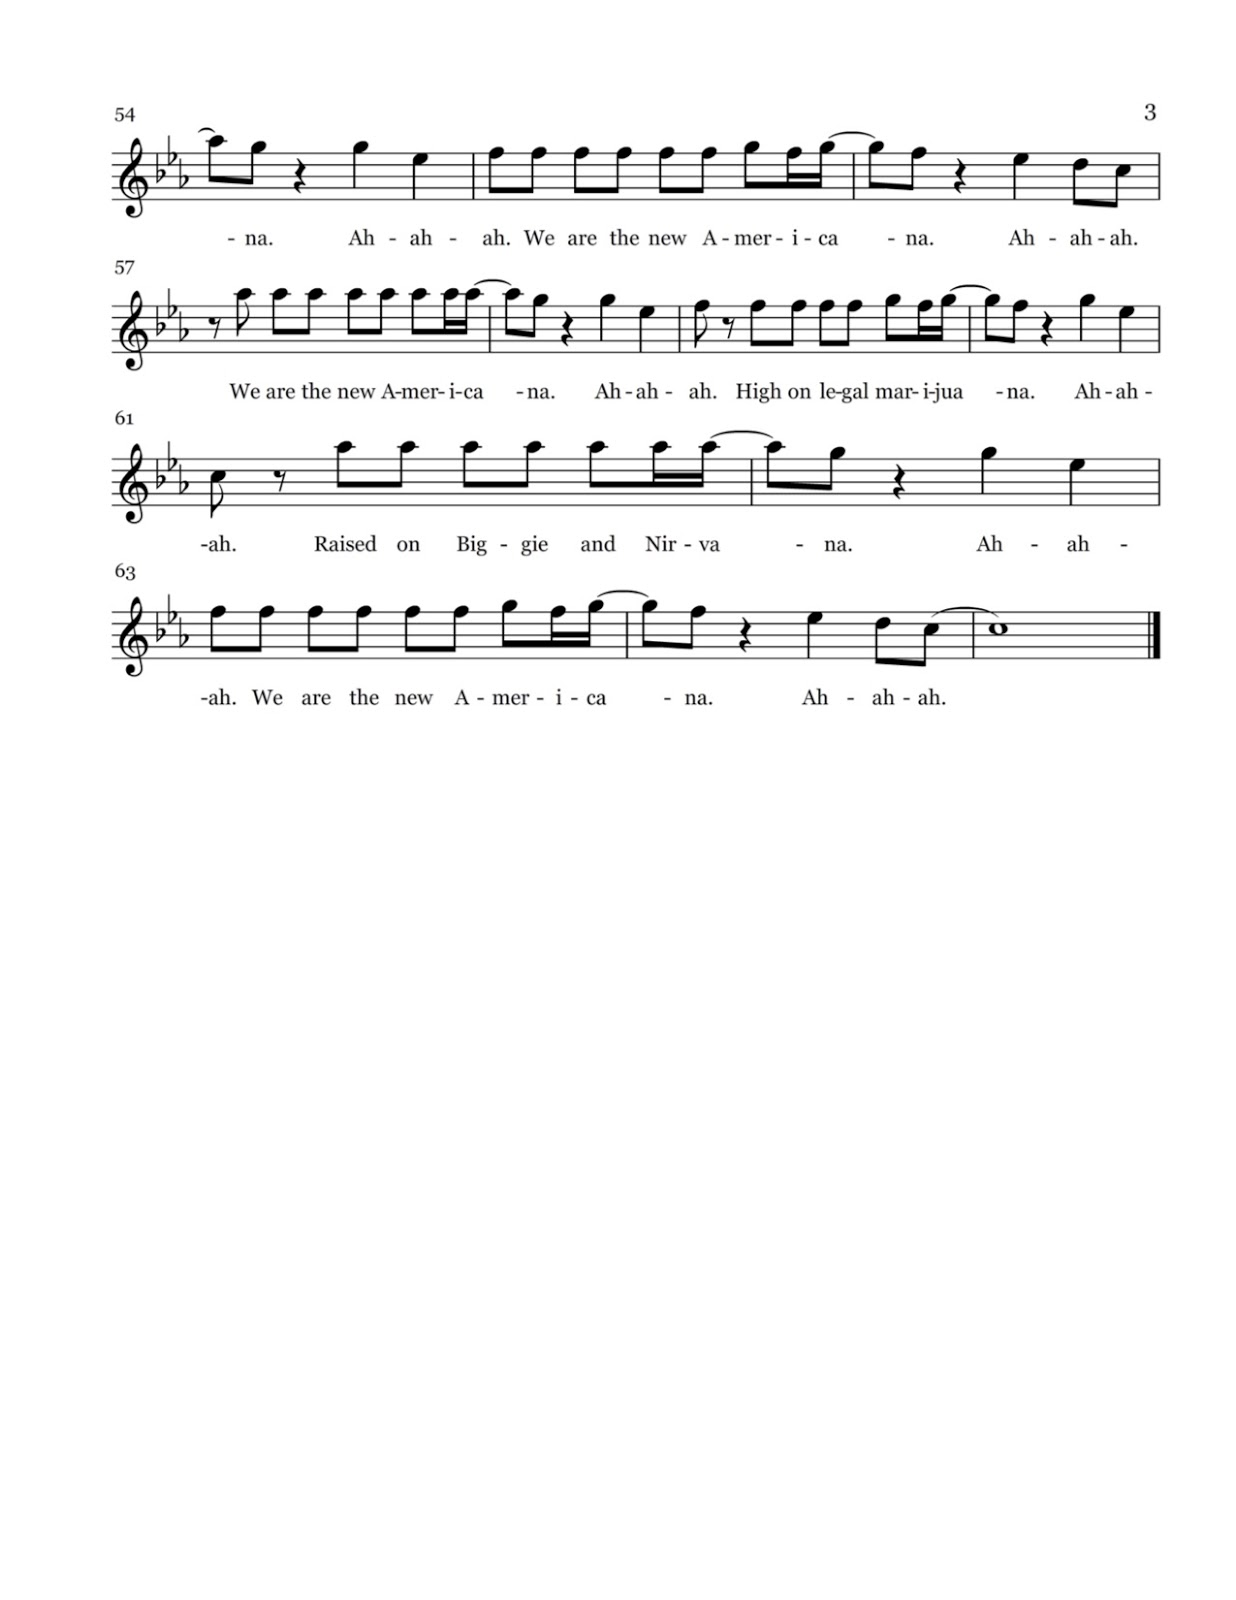 Flute sheet music new americana sheet music new americana sheet music hexwebz Gallery